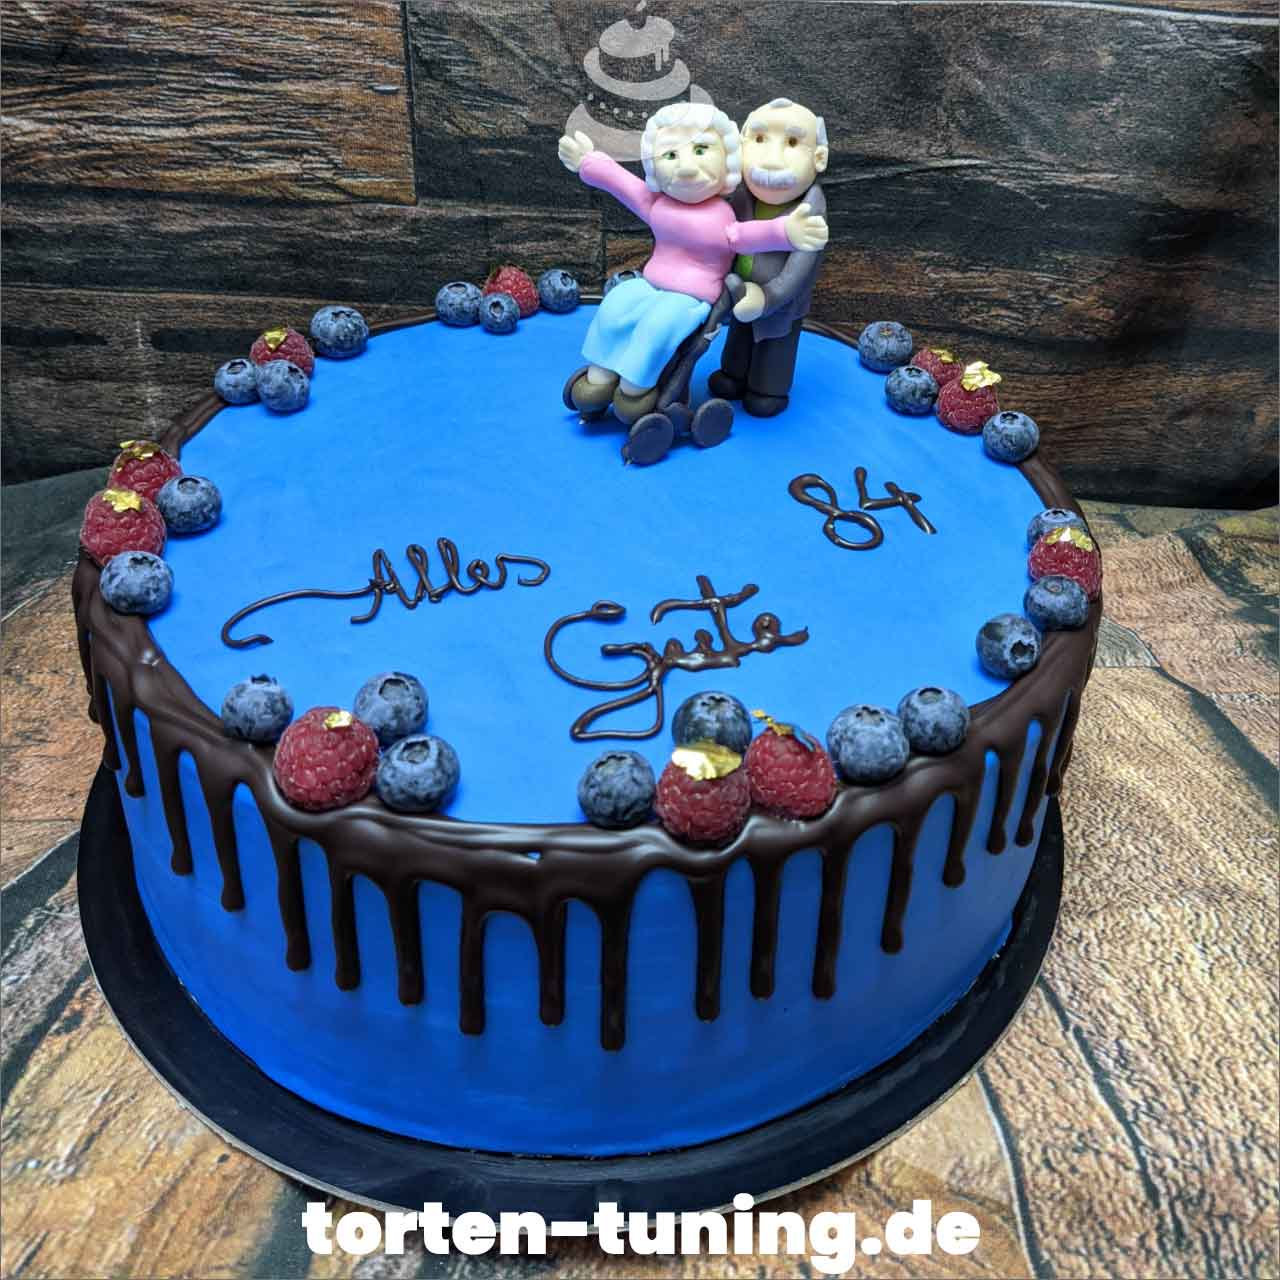 Oma Opa Rollator Dripcake Obsttorte Geburtstagstorte Motivtorte Torte Tortendekoration Torte online bestellen Suhl Thüringen Torten Tuning Sahnetorte Tortenfiguren Cake Topper